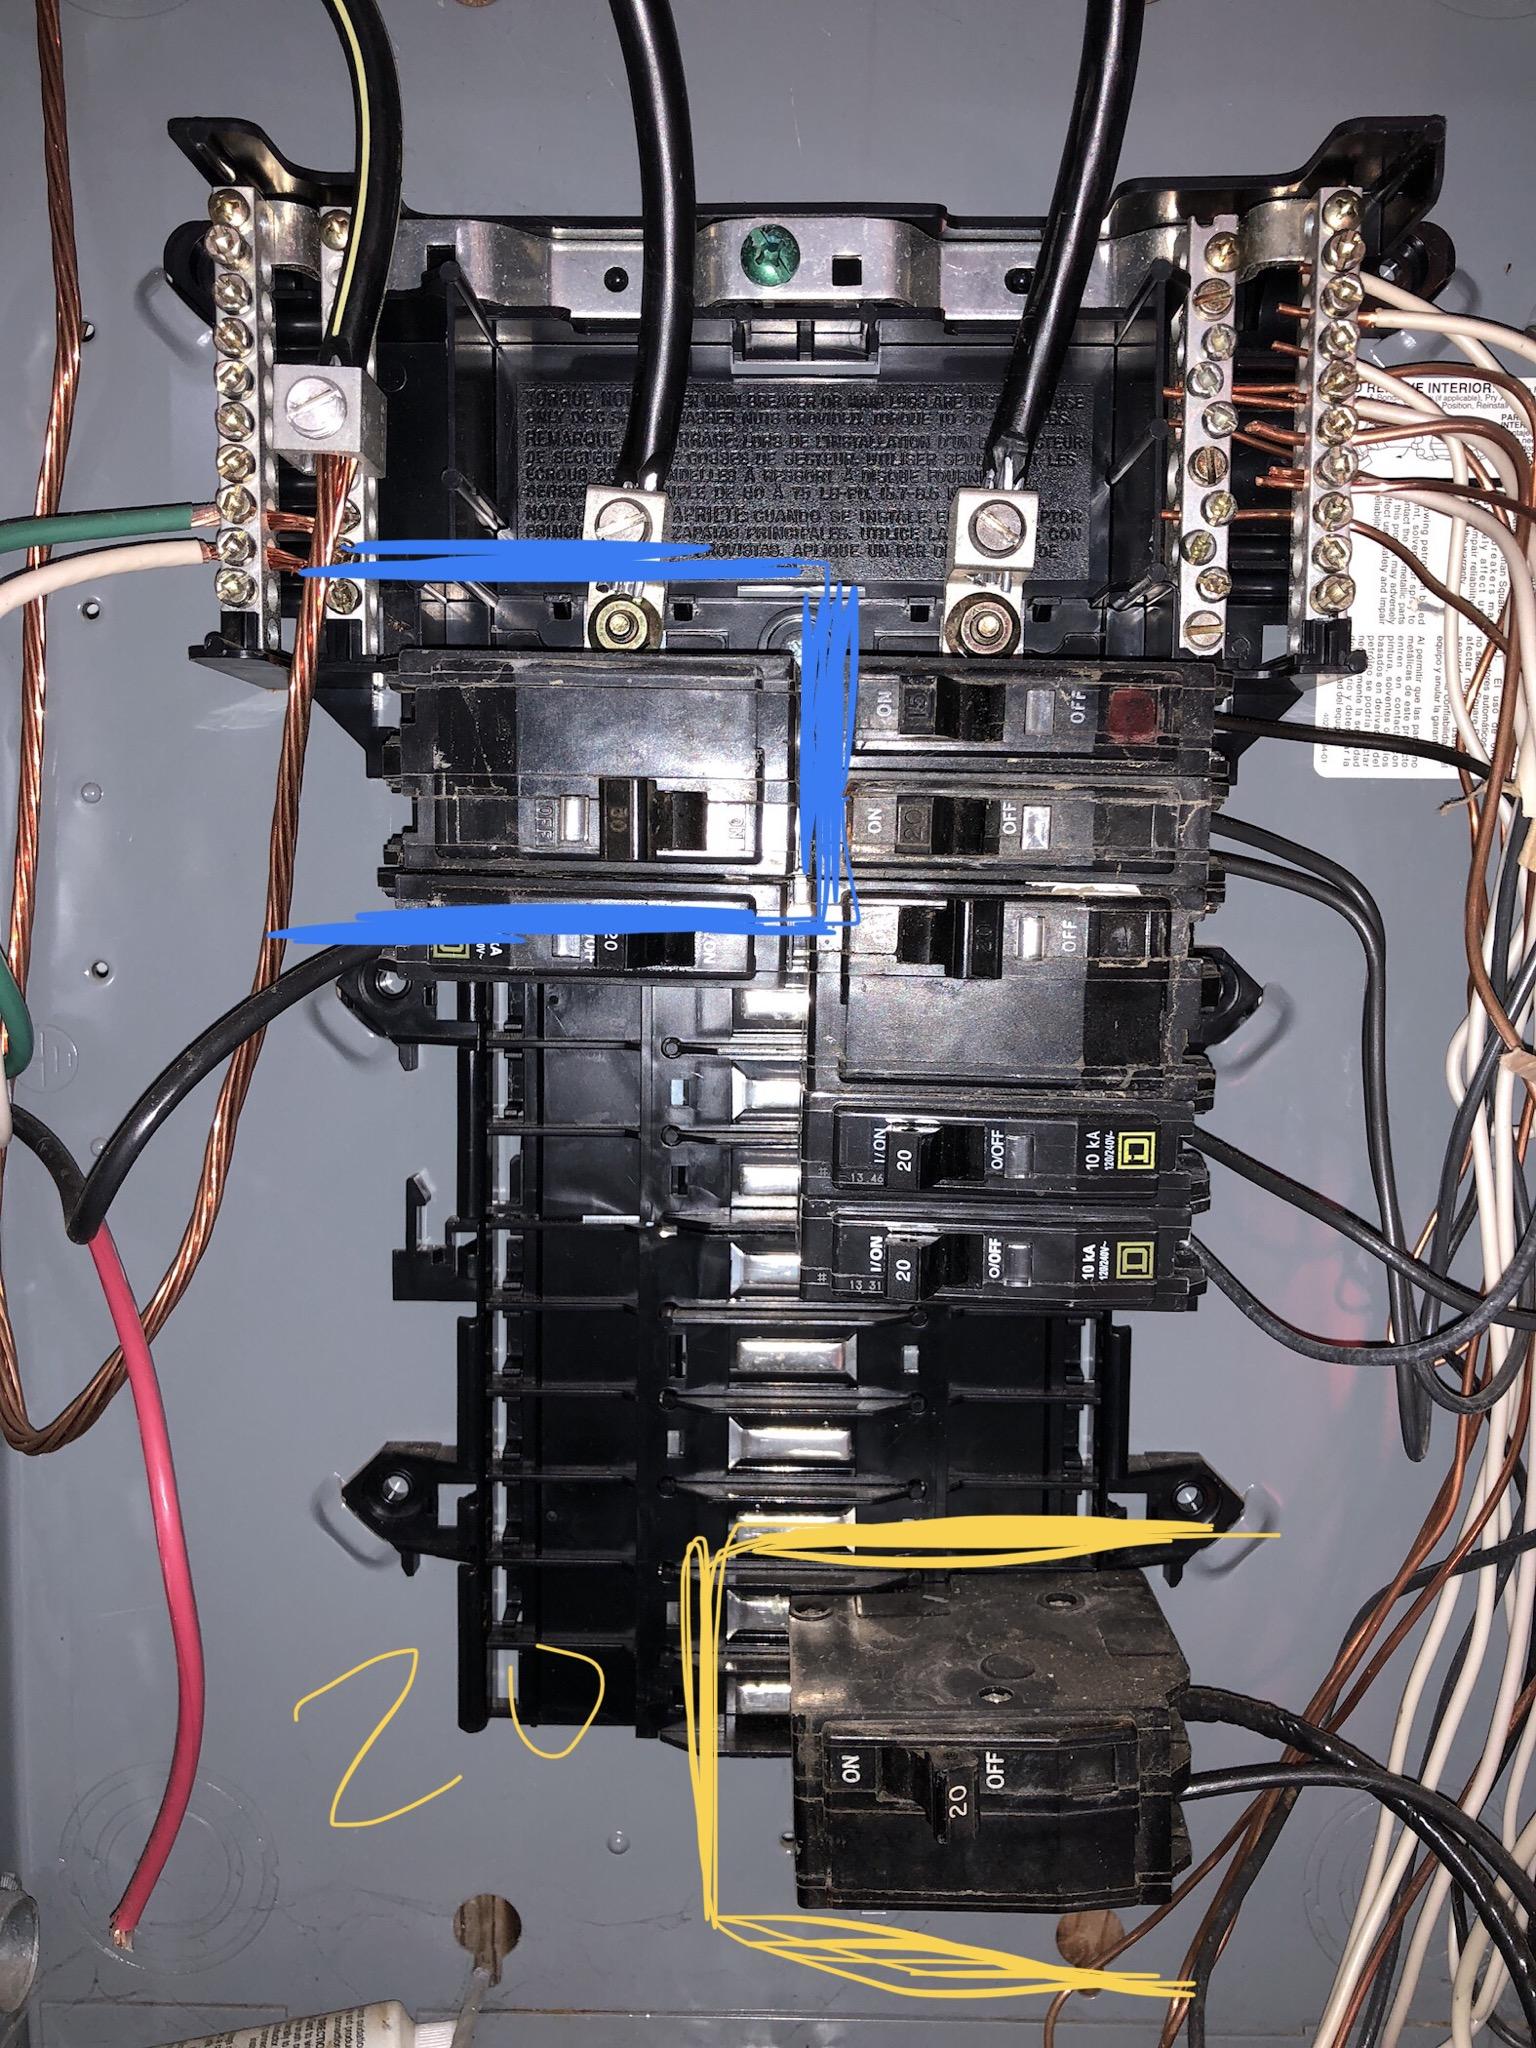 Generator to house wiring | Michigan Sportsman - Online Michigan ...